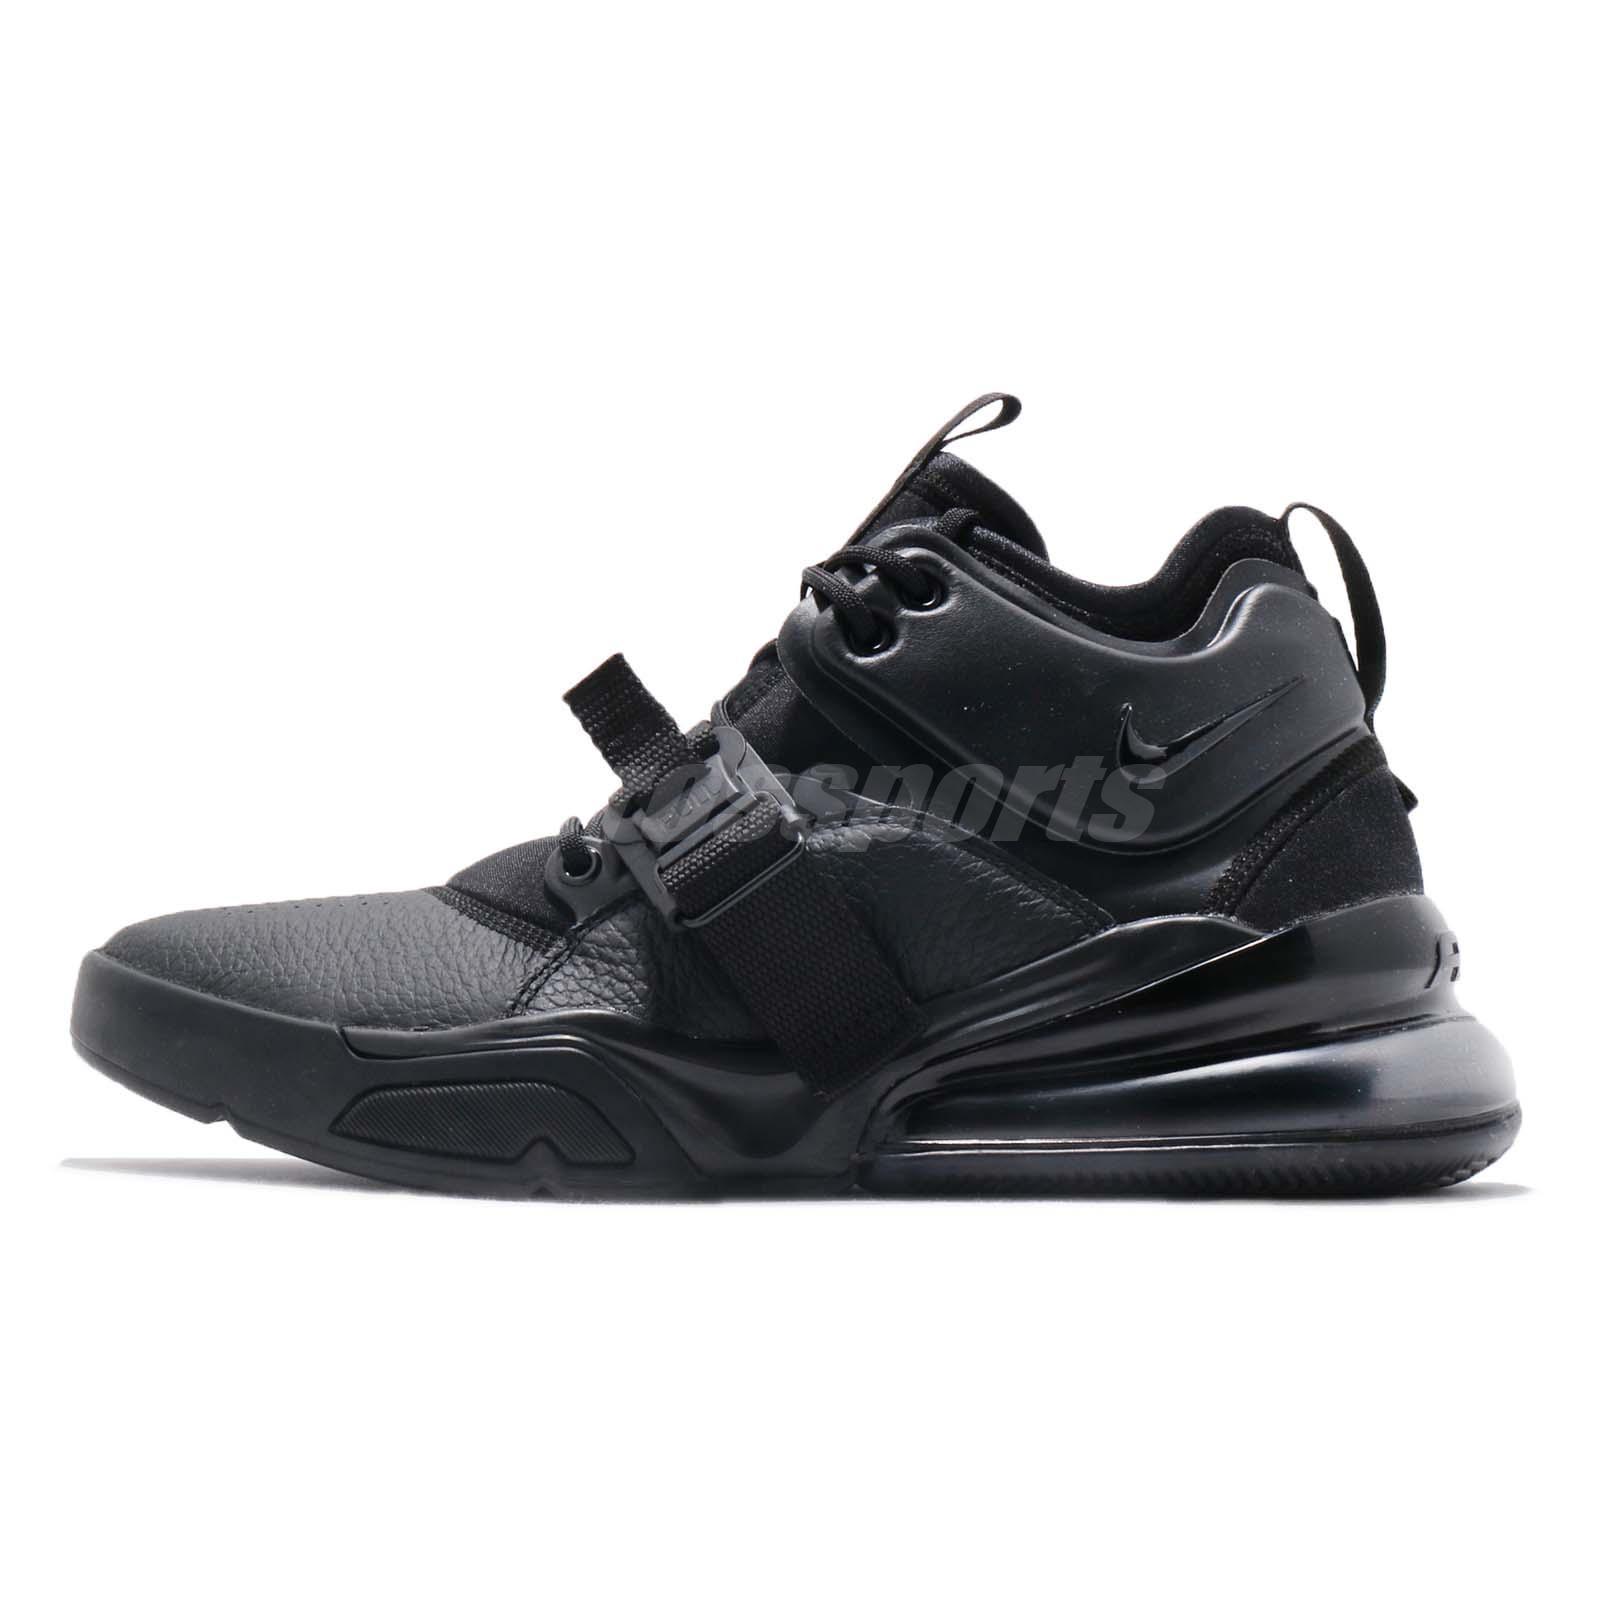 fd7e6a08b22dc8 Nike Air Force 270 Triple Black Men Lifestyle Casual Shoes Sneakers  AH6772-010